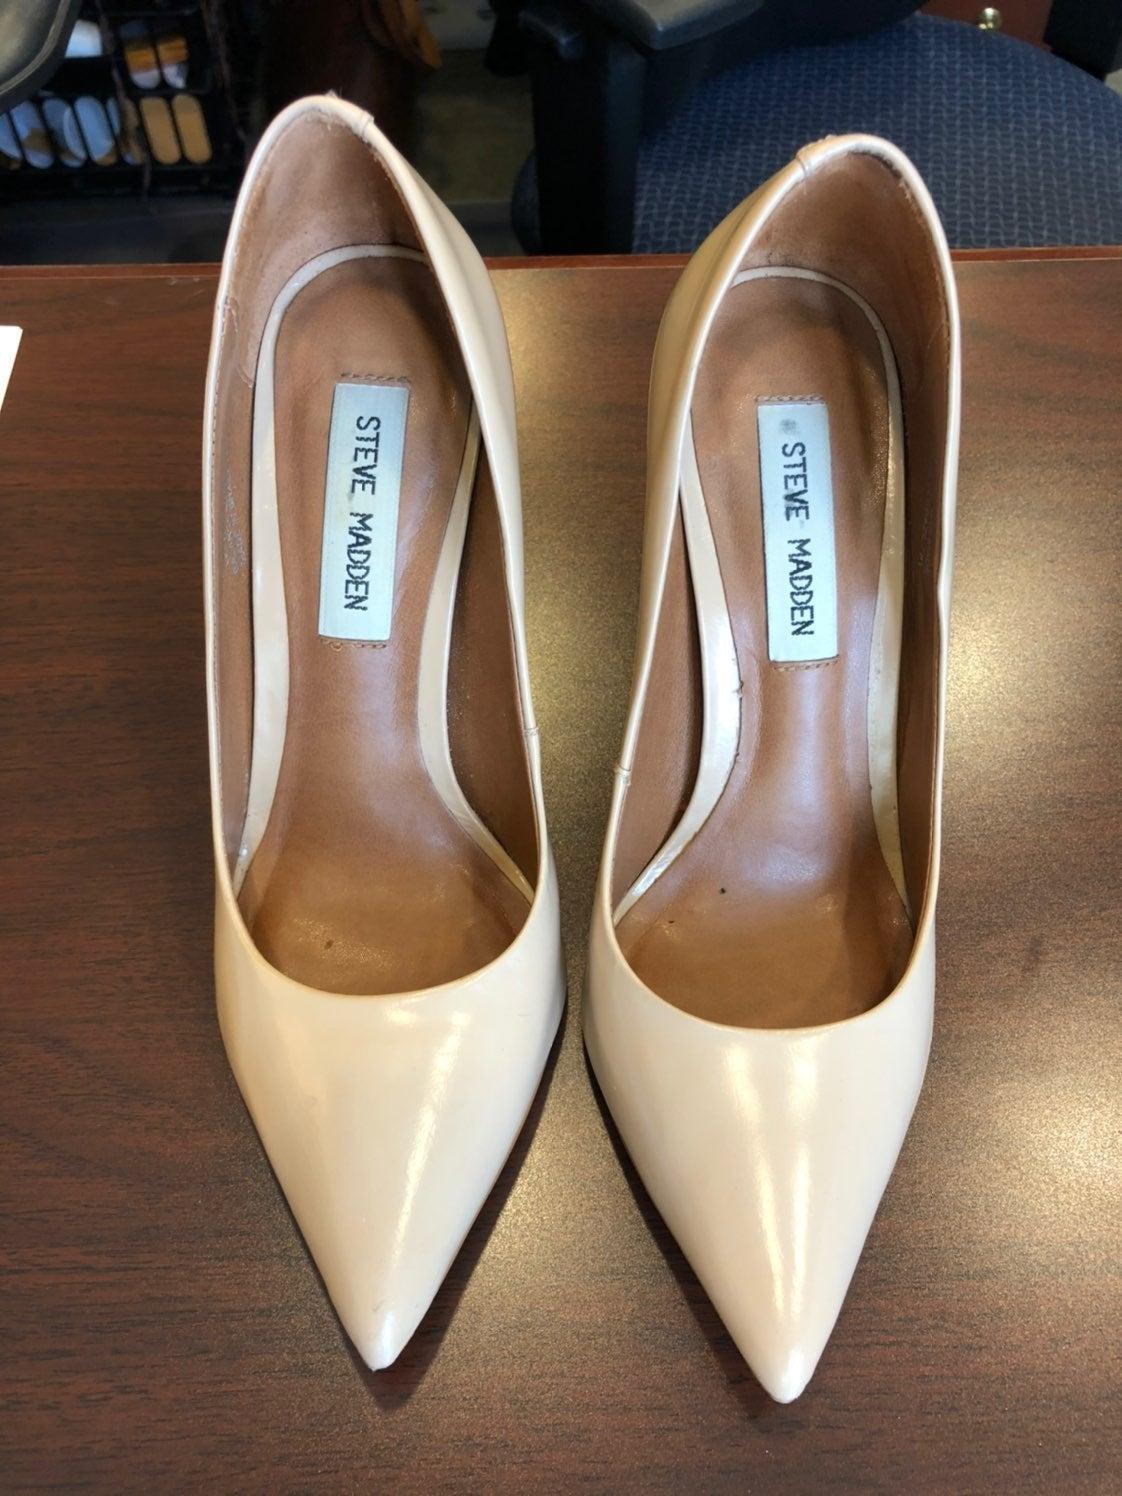 Steve Madden Proto pumps heels